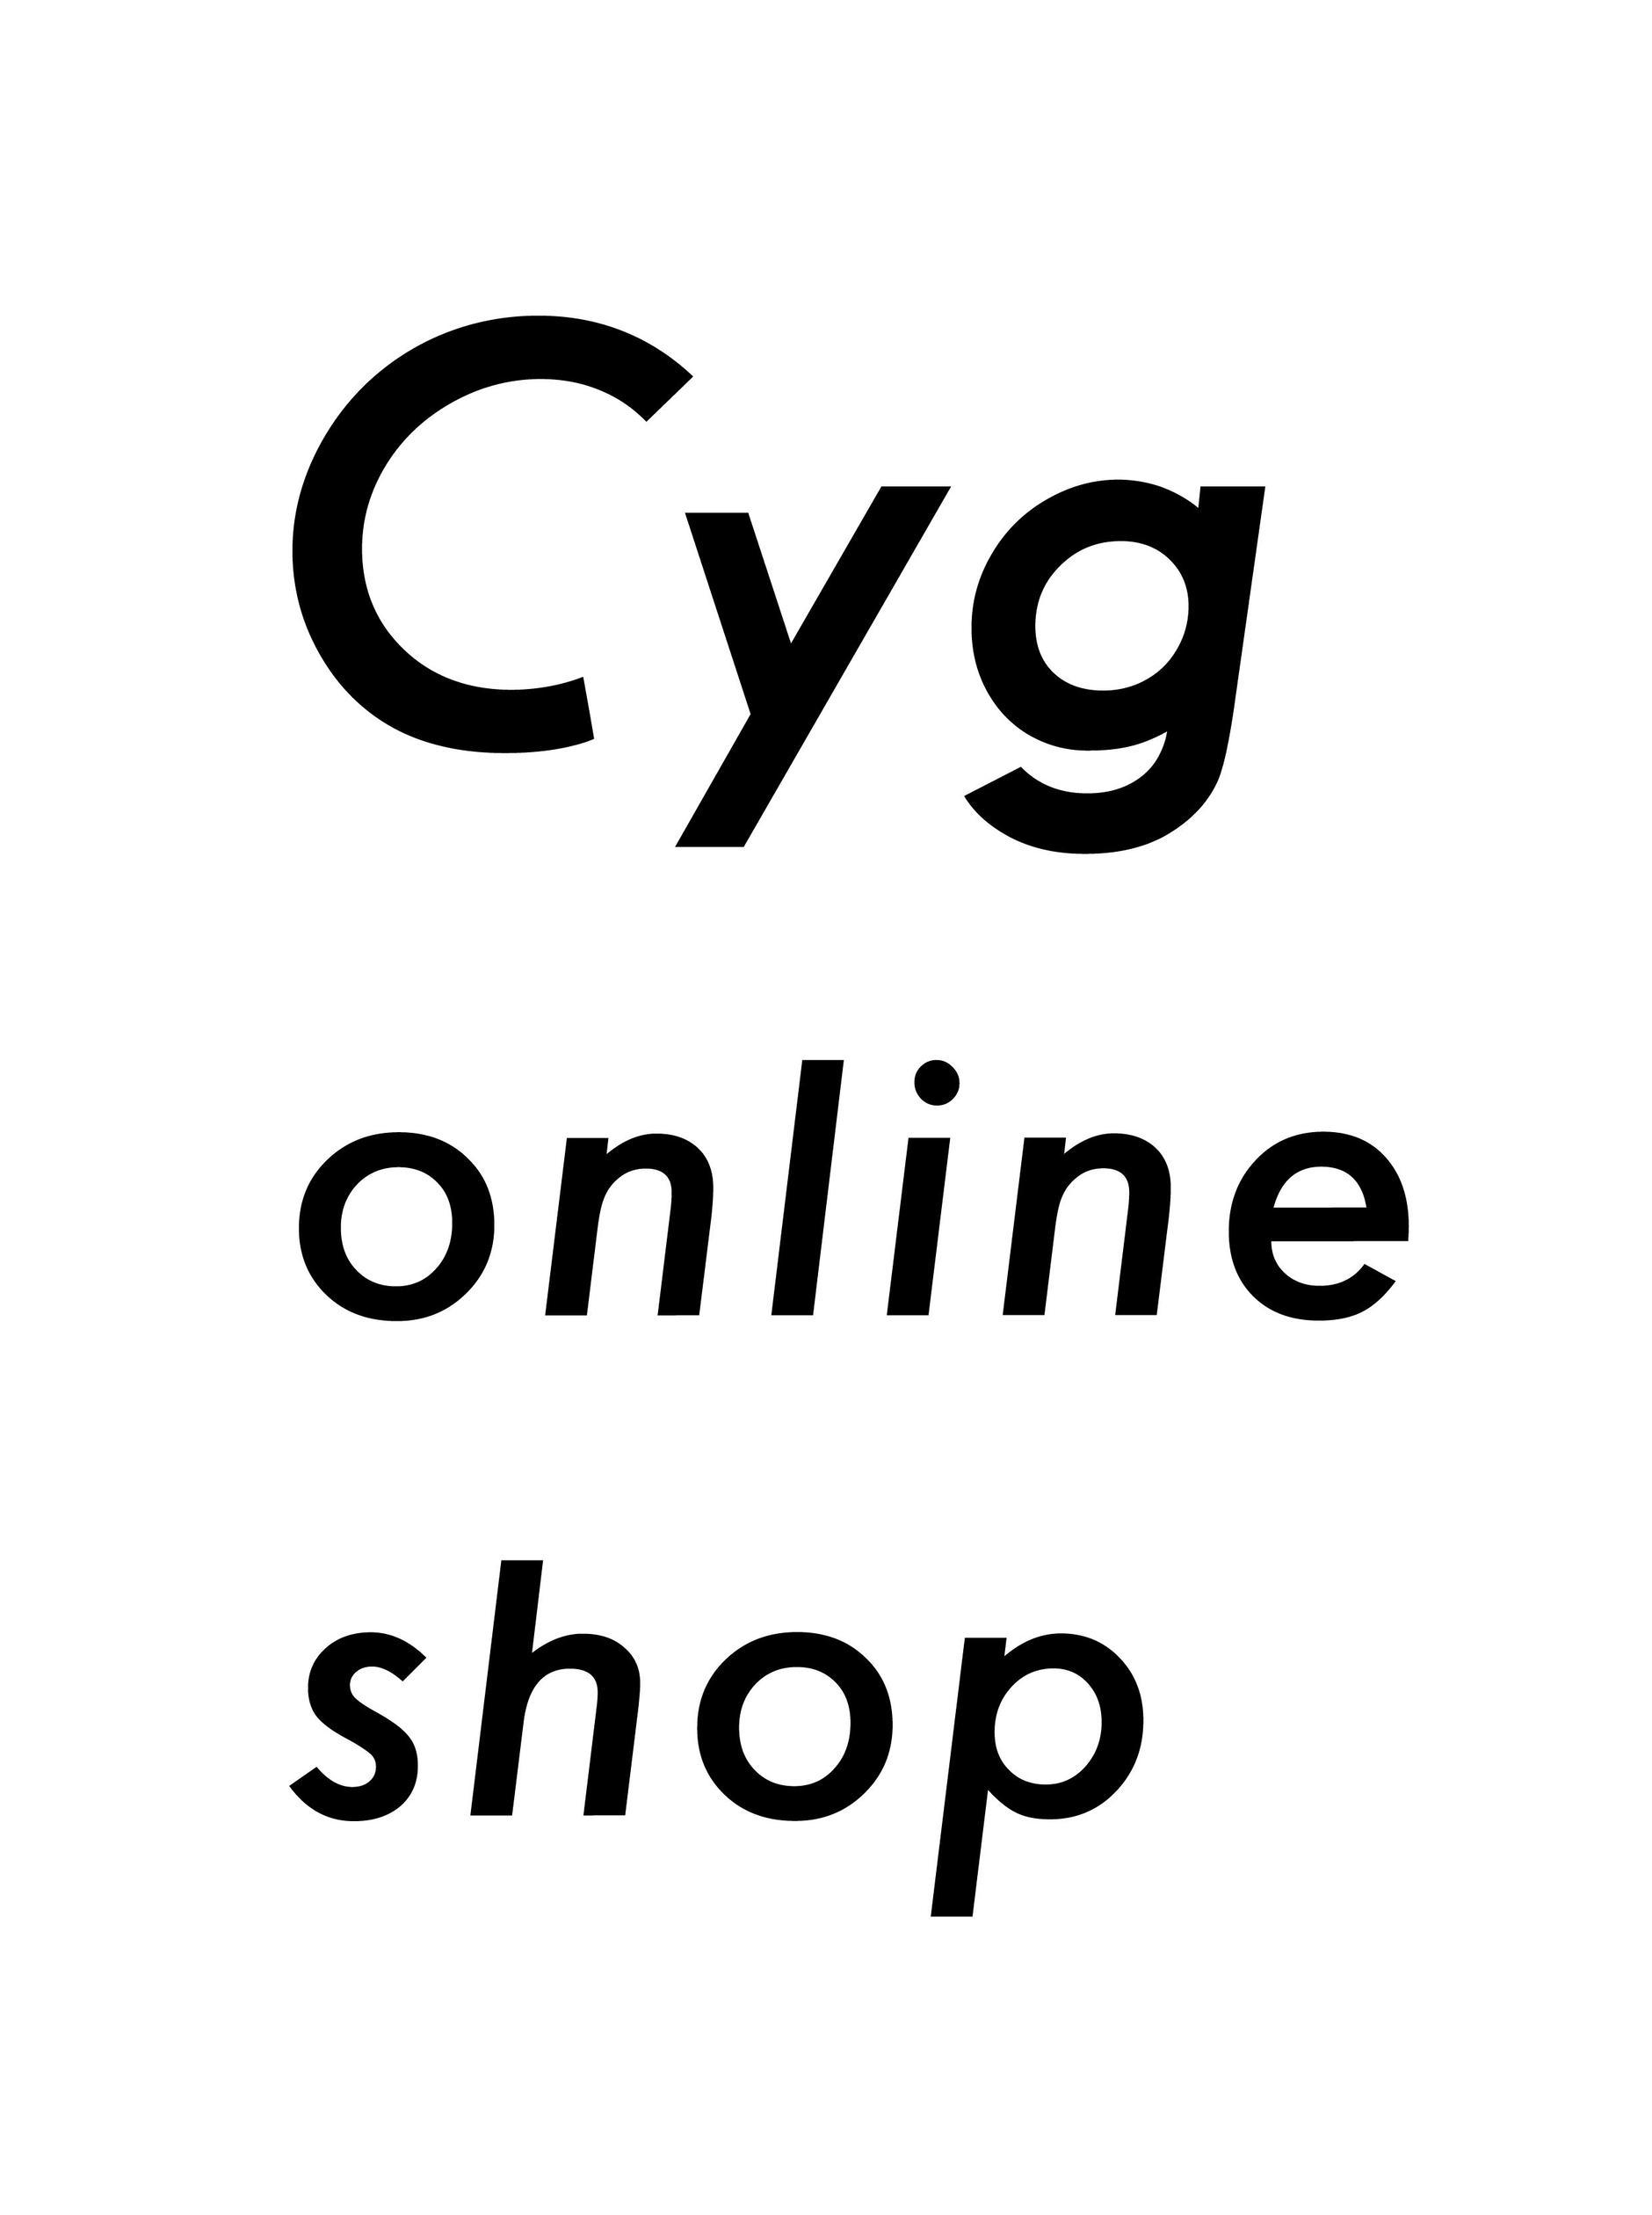 Cyg art gallery